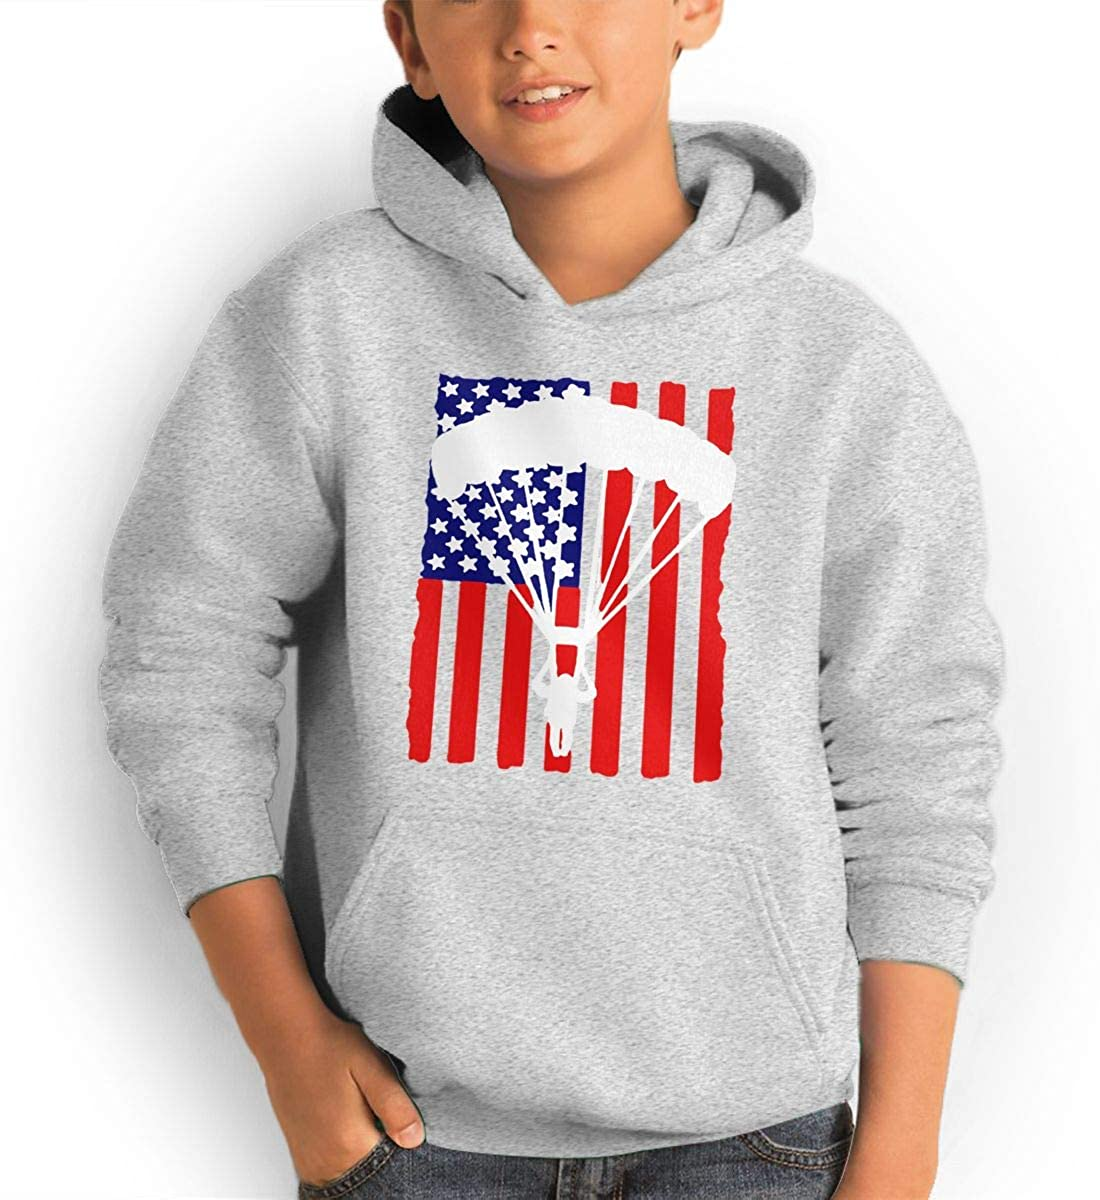 Red Coffee Teen Fashion Hoodie Hooded Sweatshirt Pocket Youth Boys Girls Sweaters,American Parachuting Skydiving USA Flag